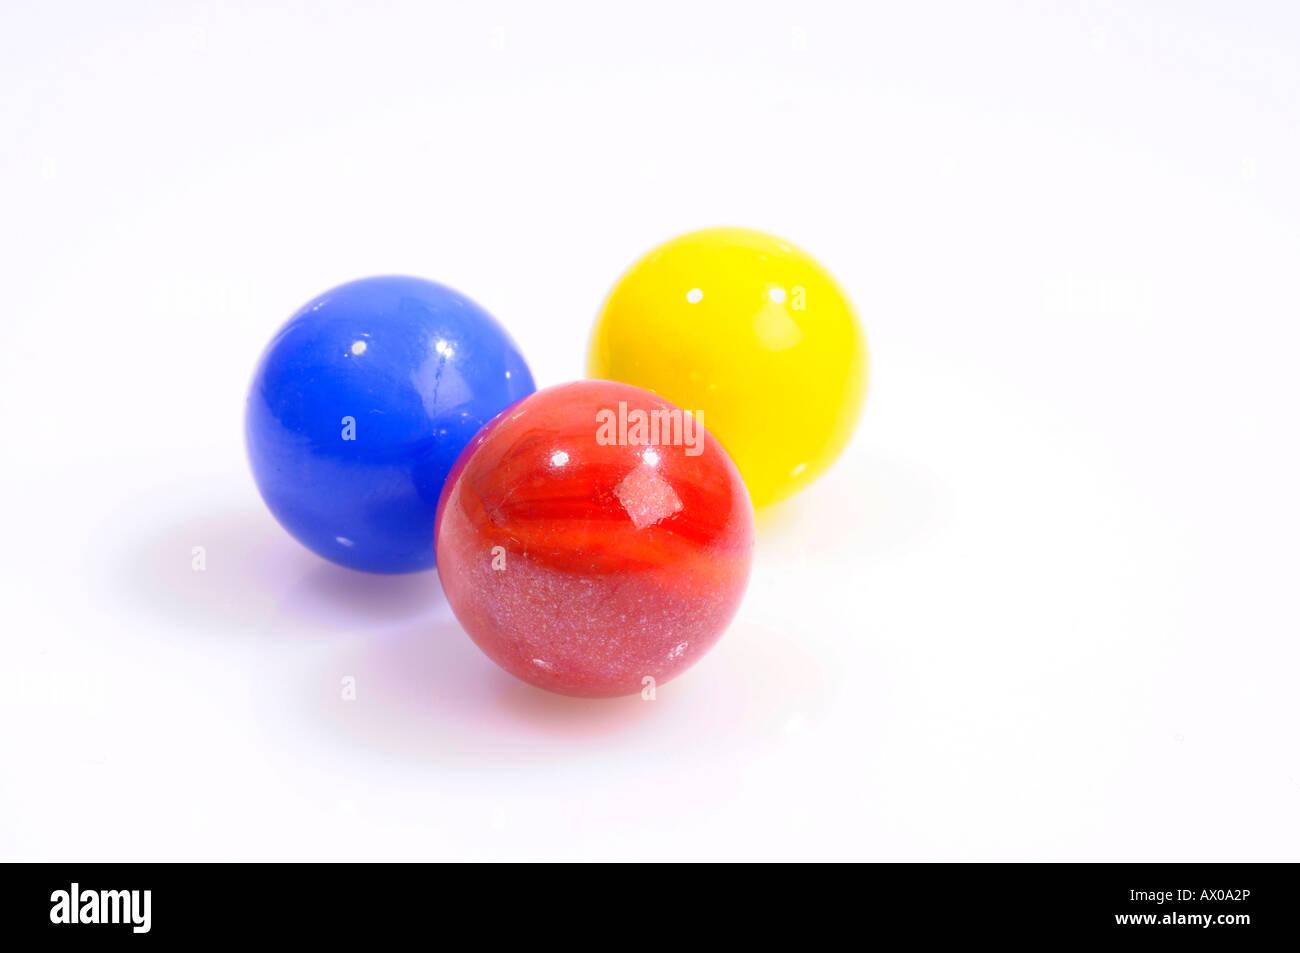 Three marbles - Stock Image